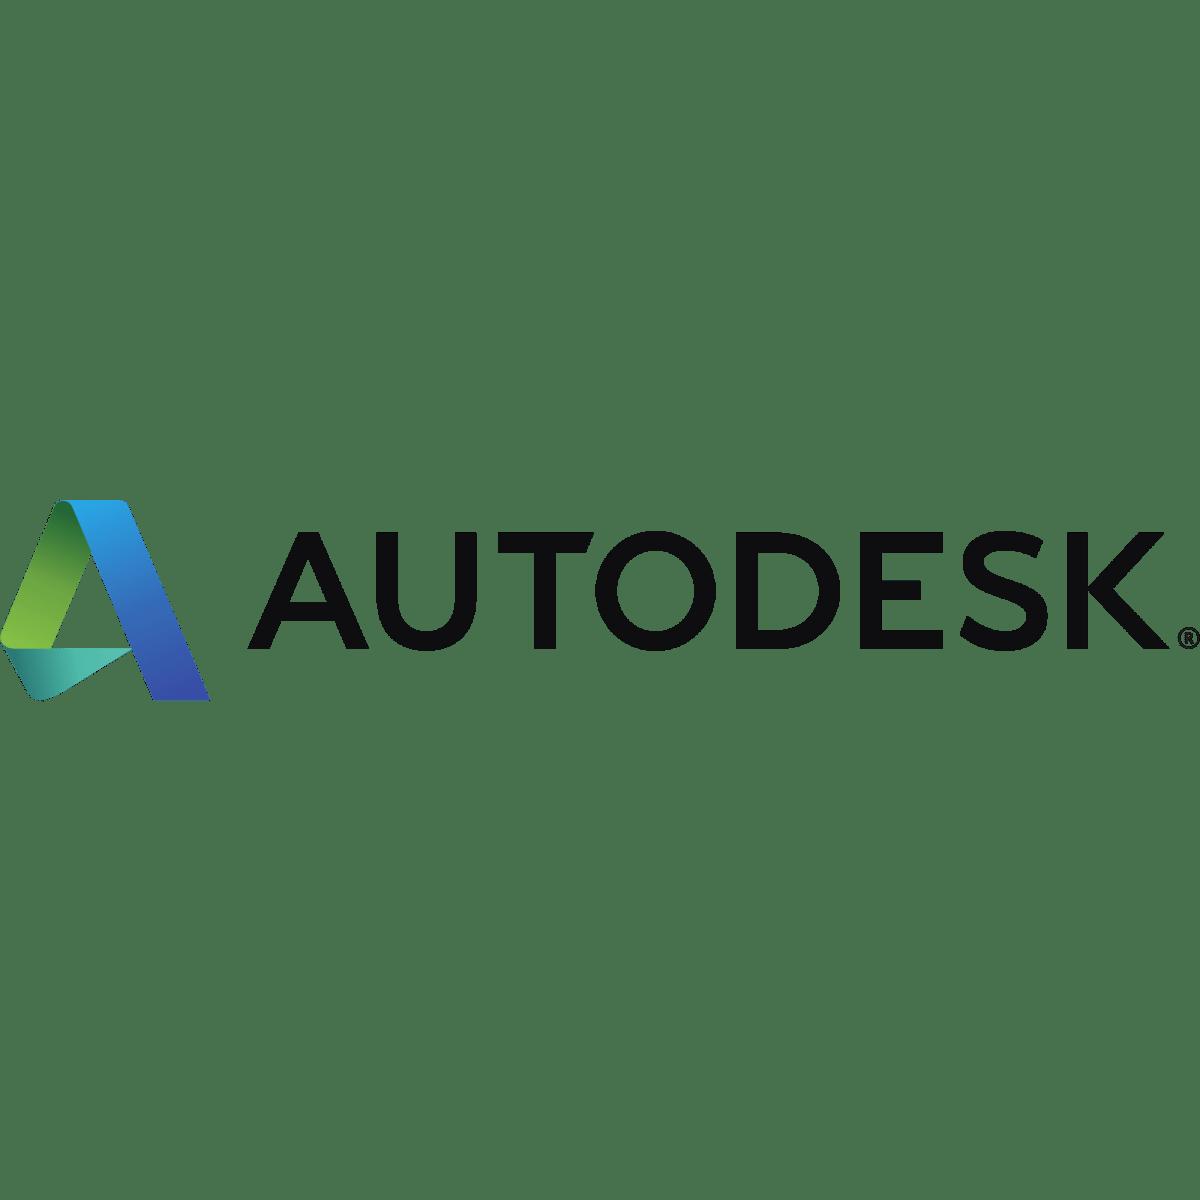 Autodesk Aktienanalyse | Bilanzanalyse - Fundamentale Aktienanalyse